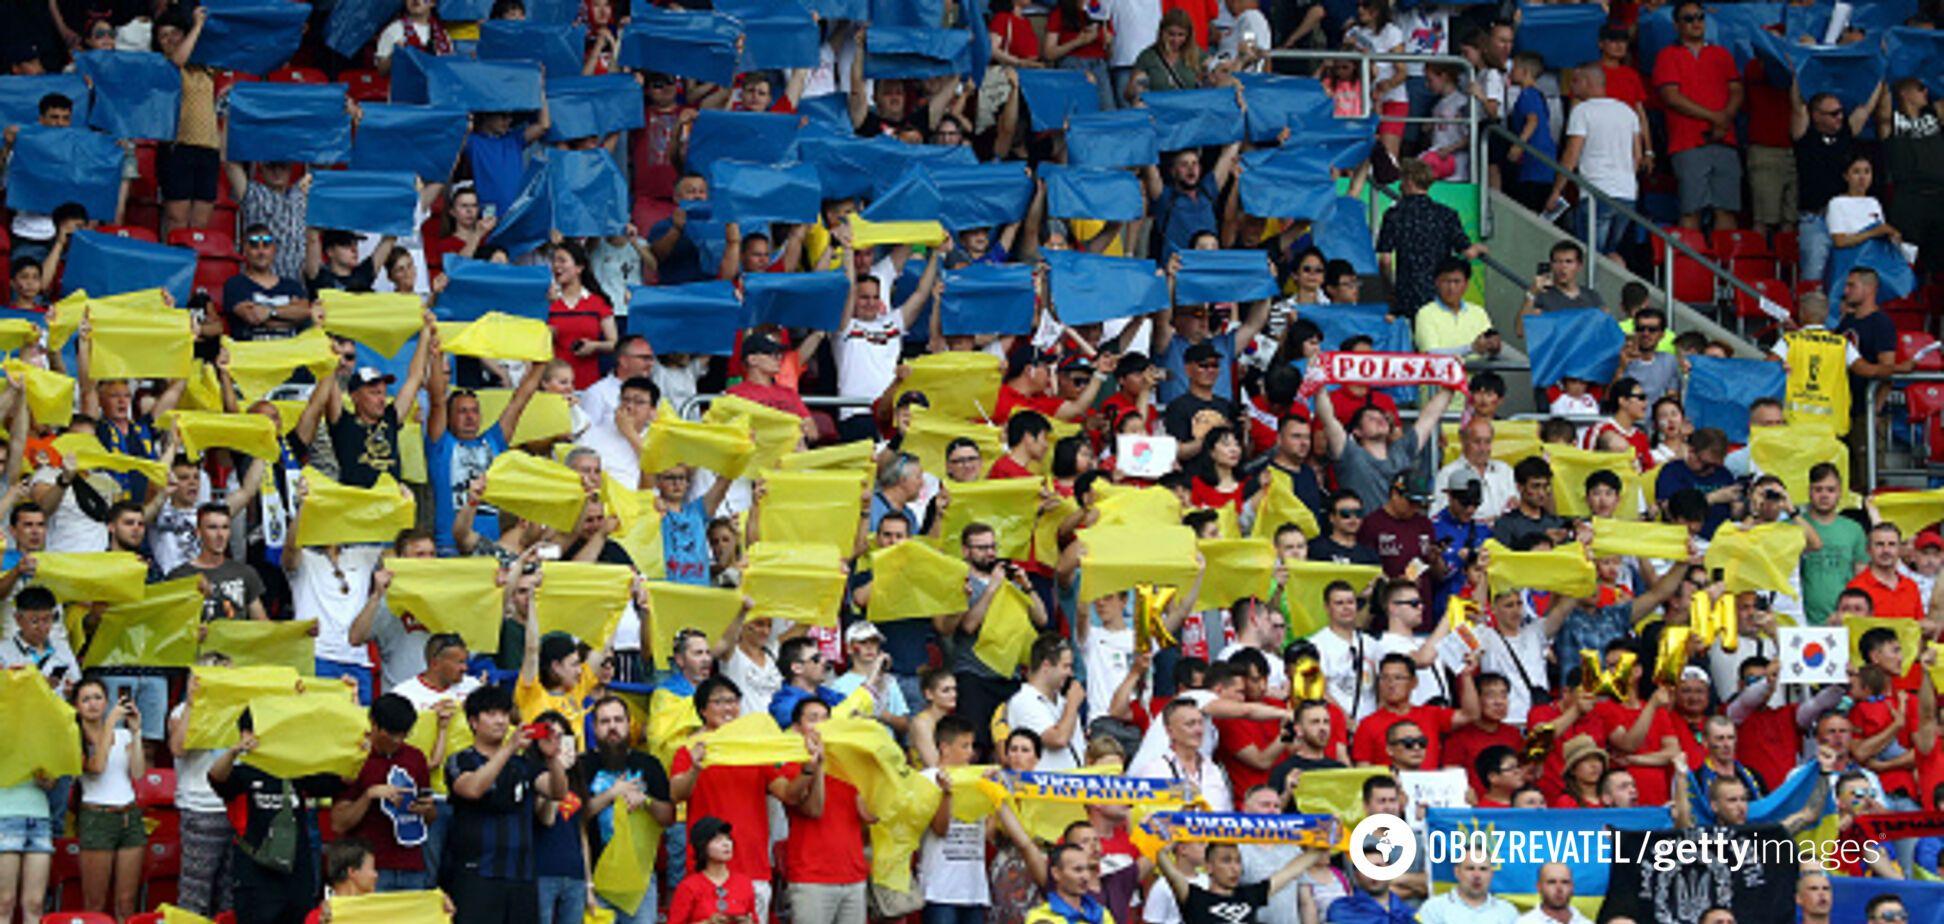 Стадион фантастически исполнил гимн Украины на финале ЧМ по футболу U-20